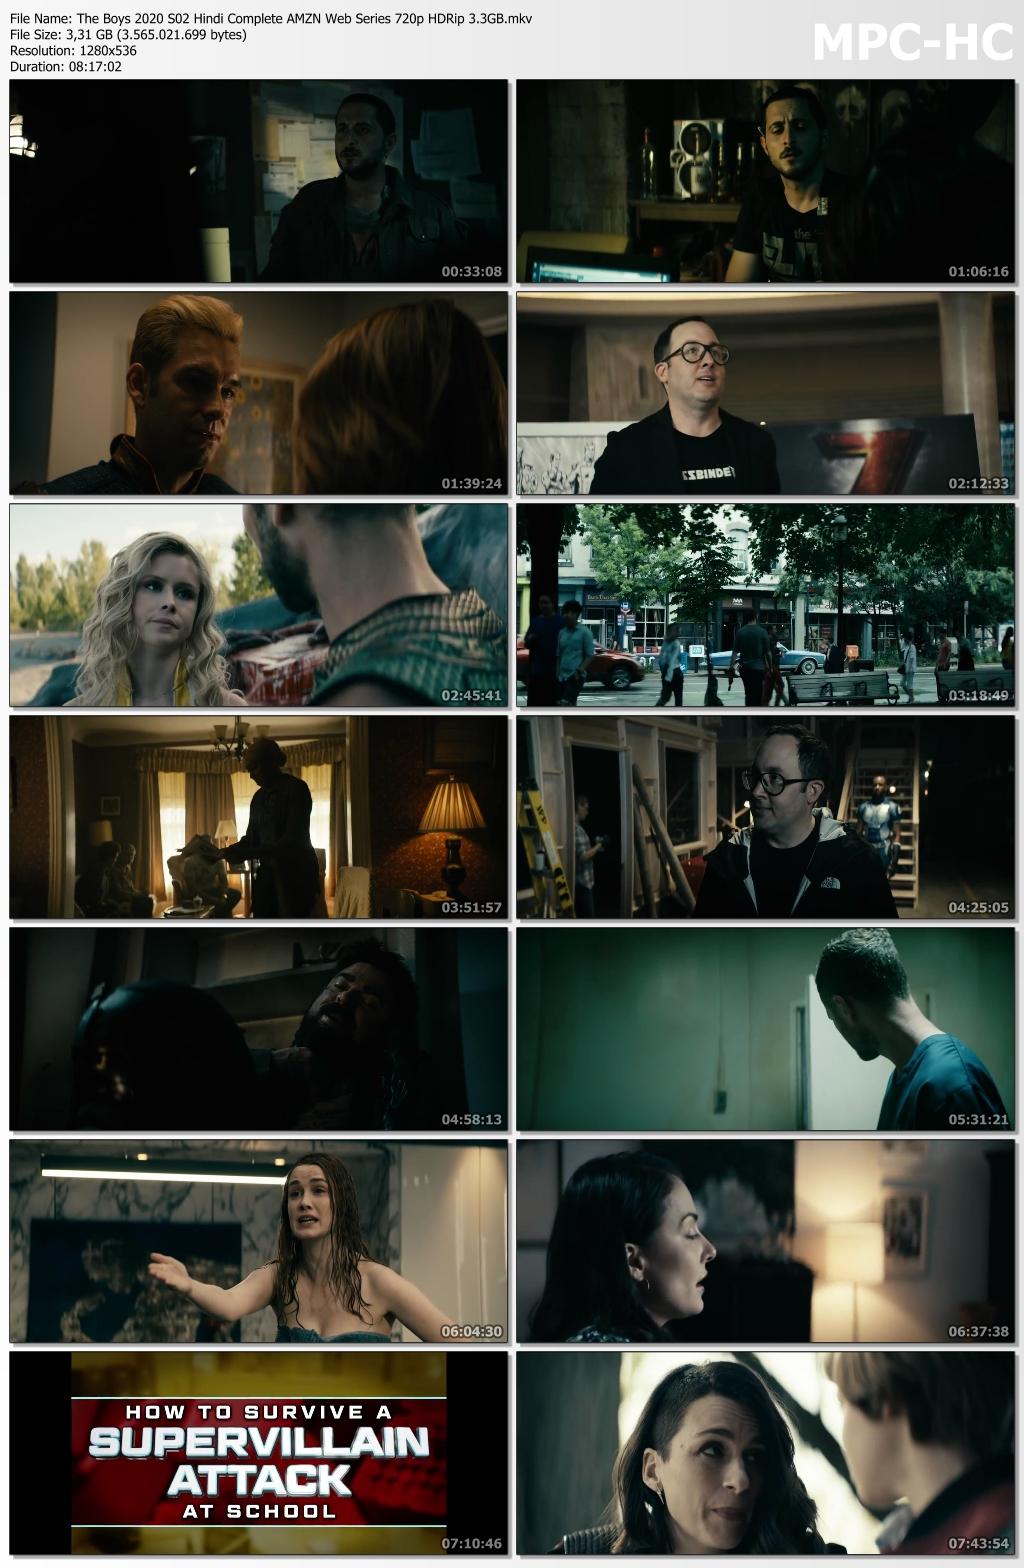 The-Boys-2020-S02-Hindi-Complete-AMZN-Web-Series-720p-HDRip-3-3-GB-mkv-thumbs